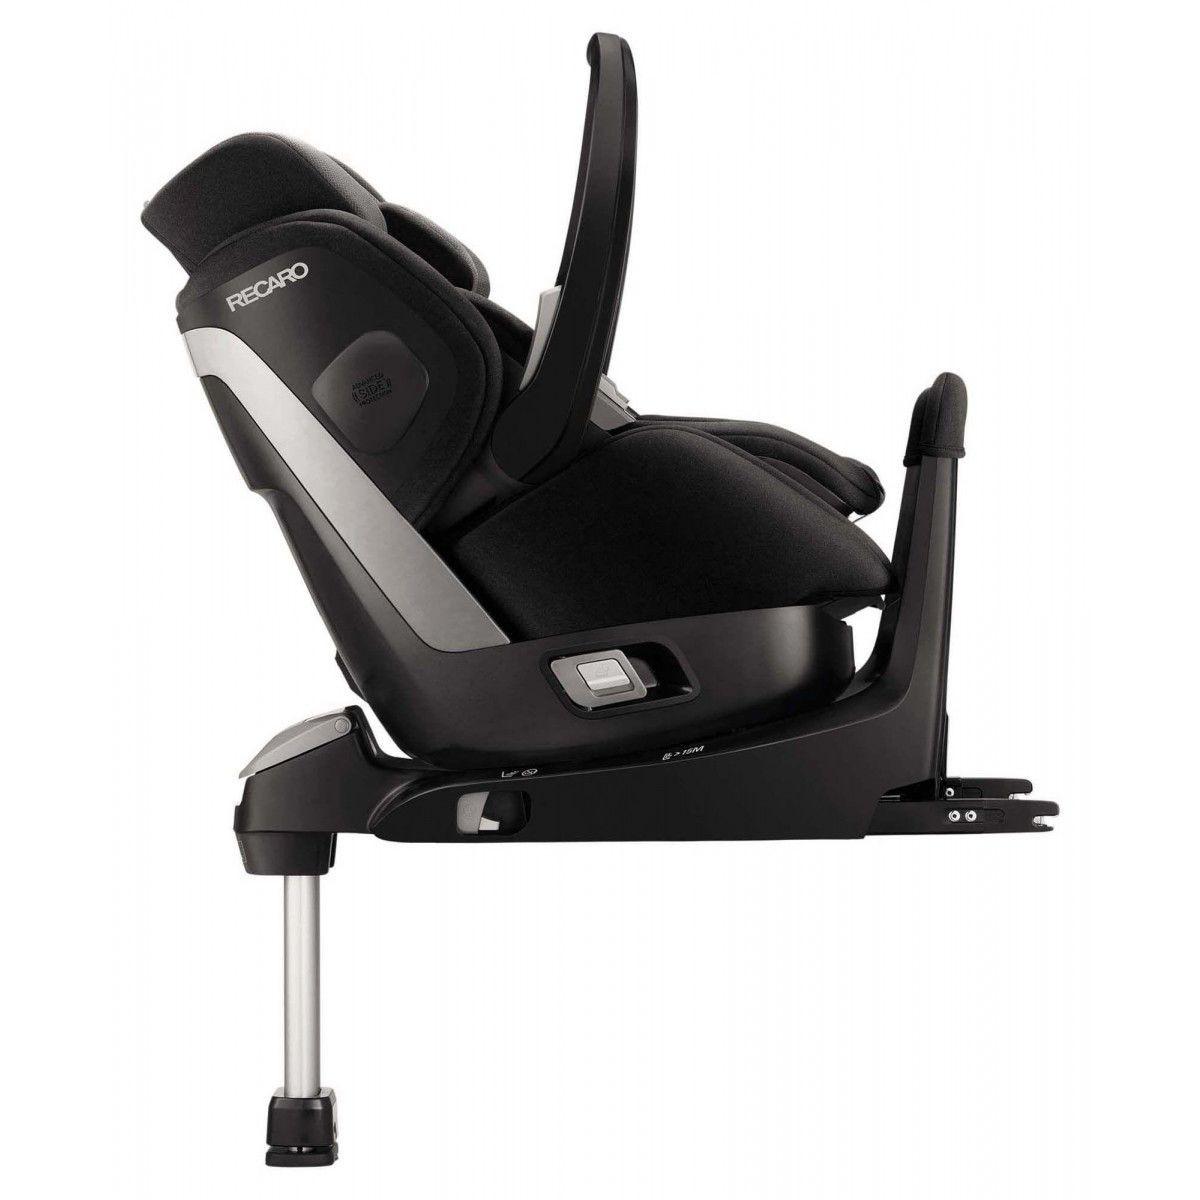 recaro zero 1 elite performance black m babystol i size. Black Bedroom Furniture Sets. Home Design Ideas